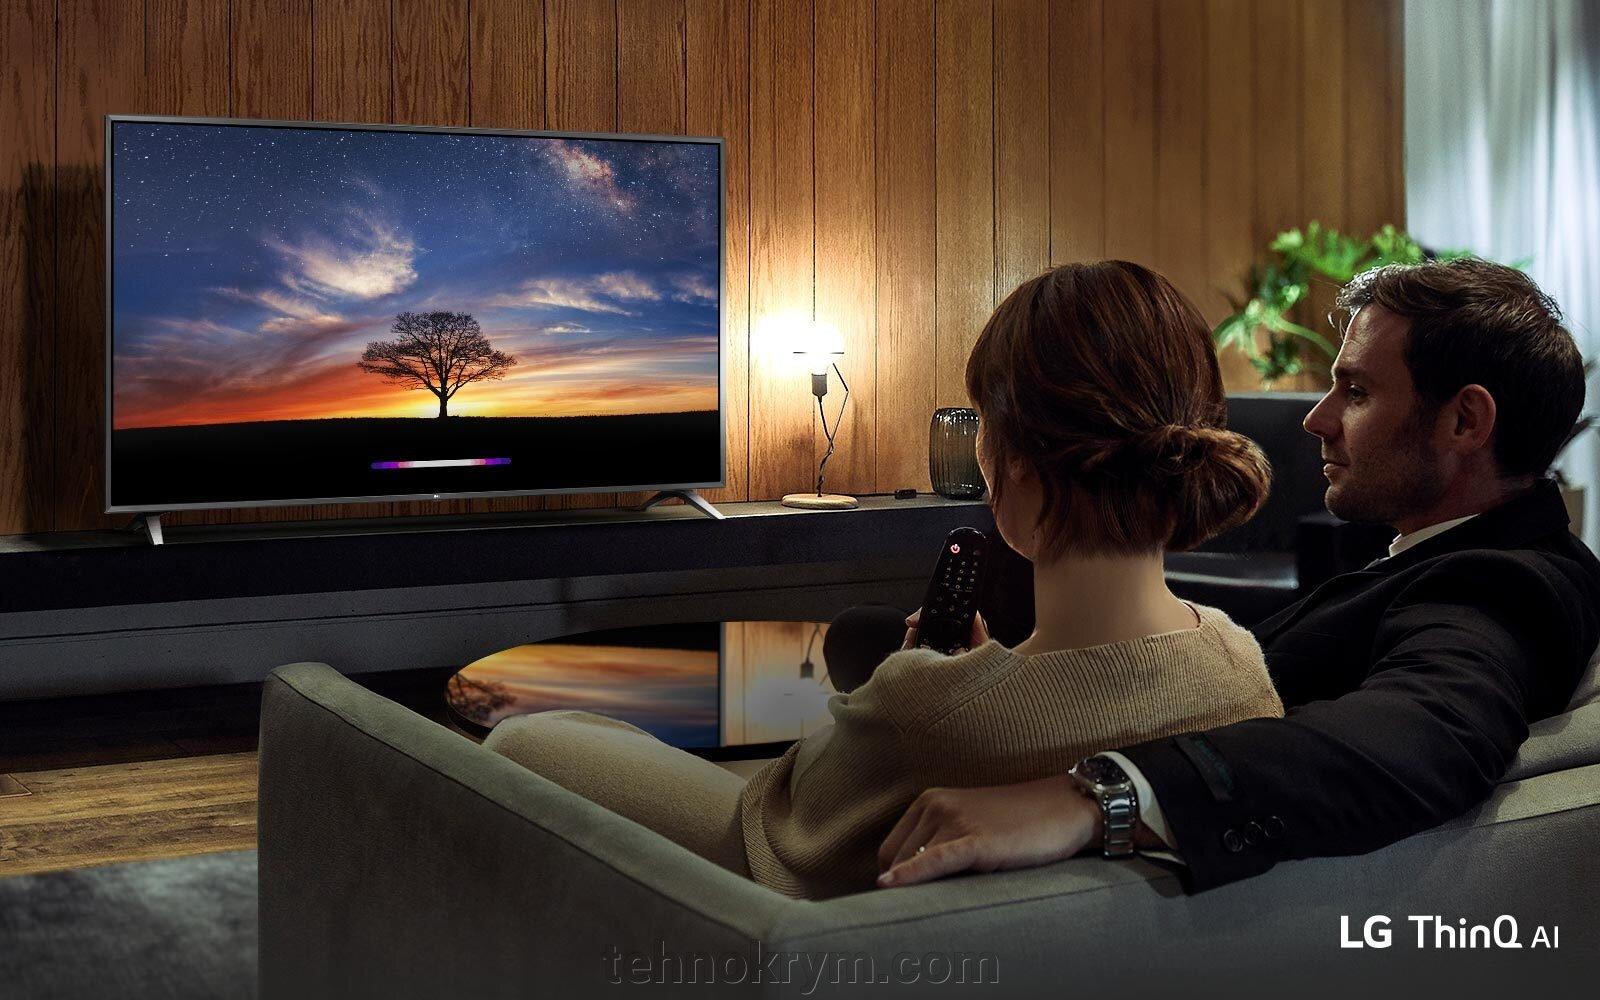 Smart Телевизор LG 65UM7450PLA, Ultra HD 4K, WebOS 4.5, новинка 2019 года - фото LG 65UM7450PLA